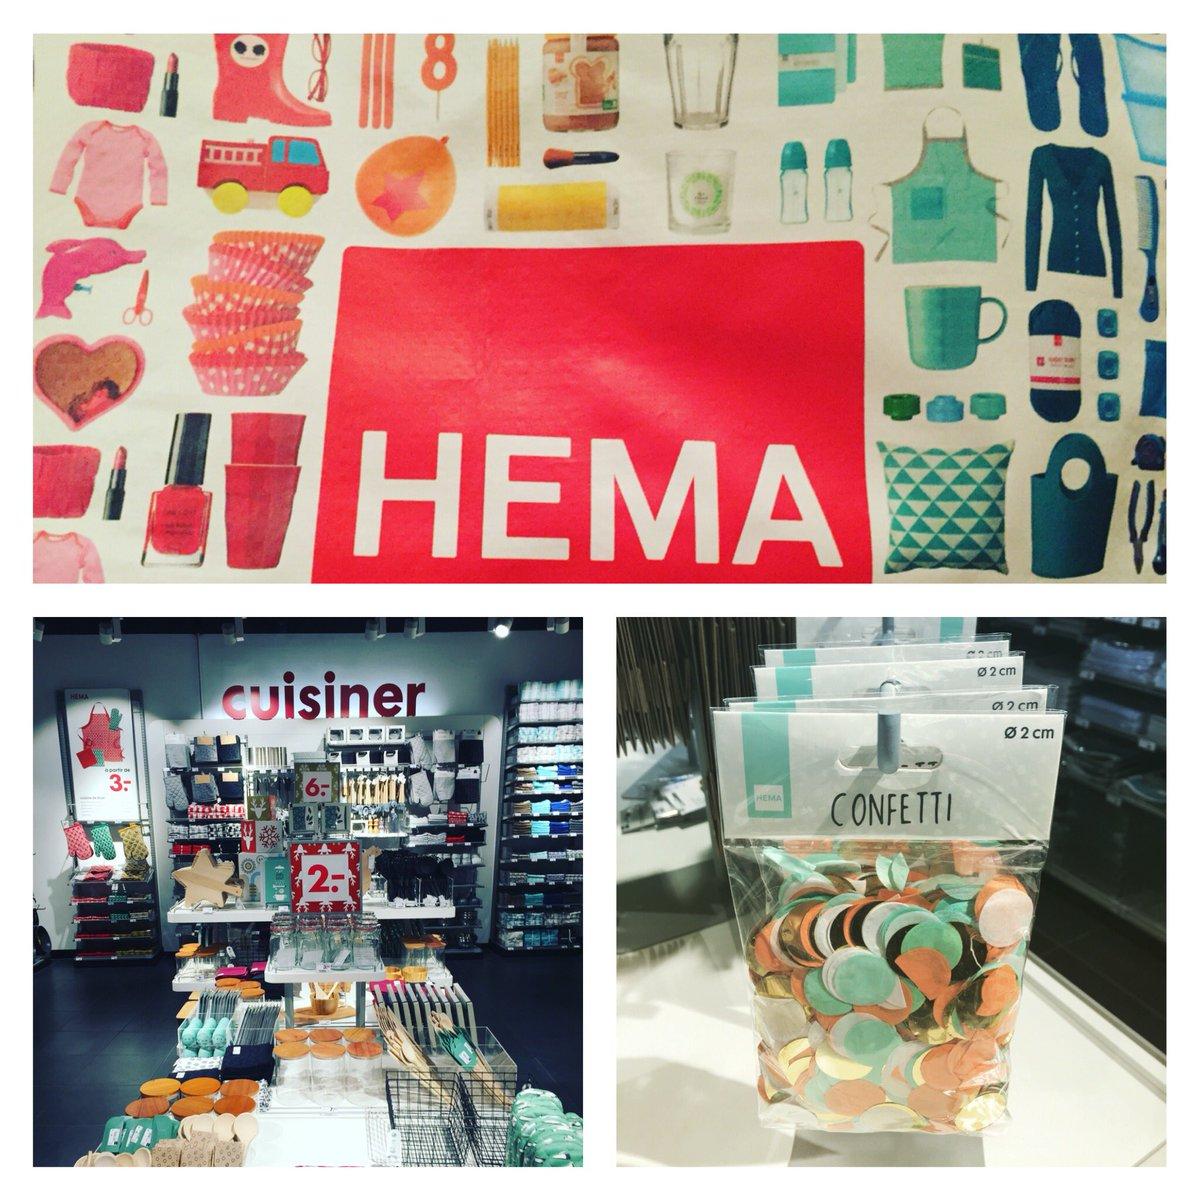 Hema france hema france twitter for Hema magasin france